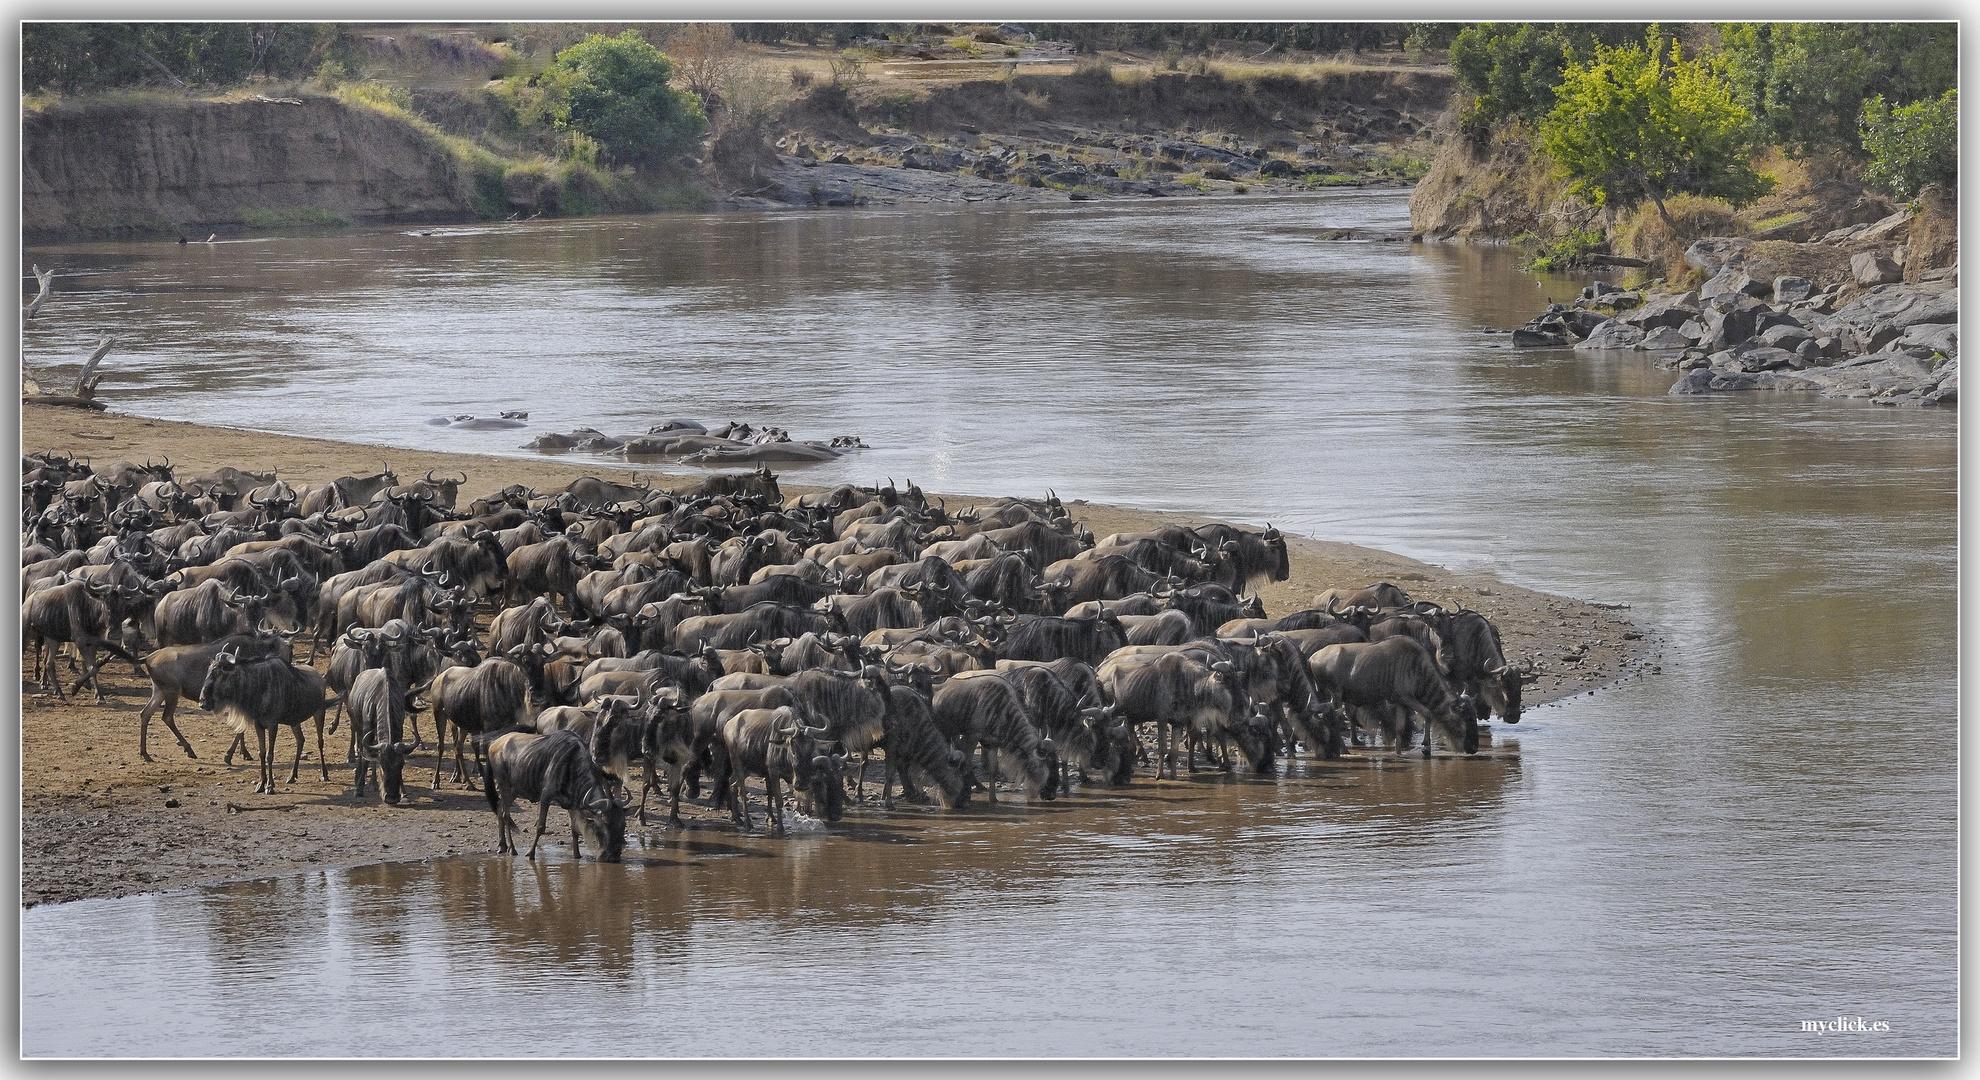 MEMORIAS DE AFRICA-ÑUS A ORILLAS DEL RIO MARA ESPERANDO CRUZARLO-KENIA